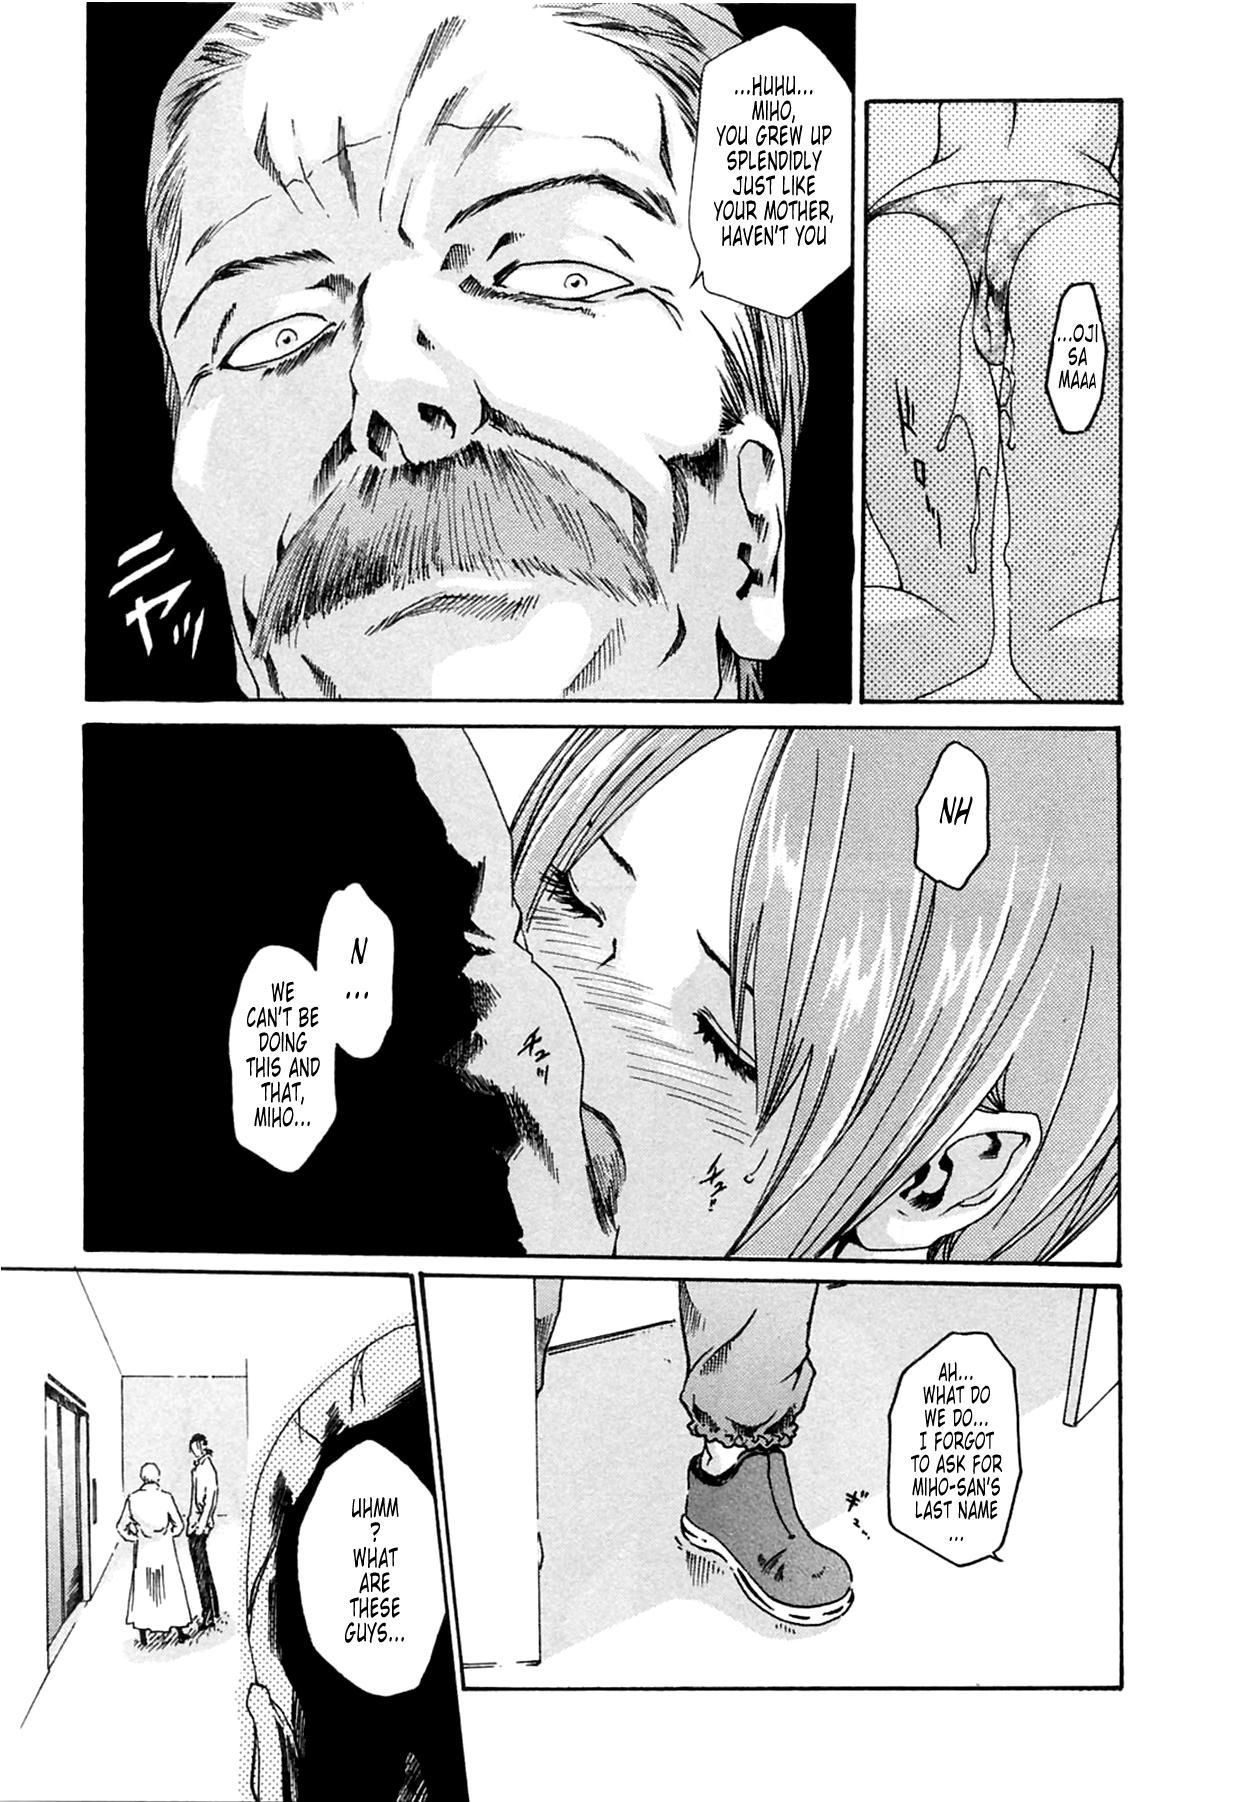 [Haruki] Kisei Juui Suzune (Parasite Doctor Suzune) Vol.02 - CH10-11 38